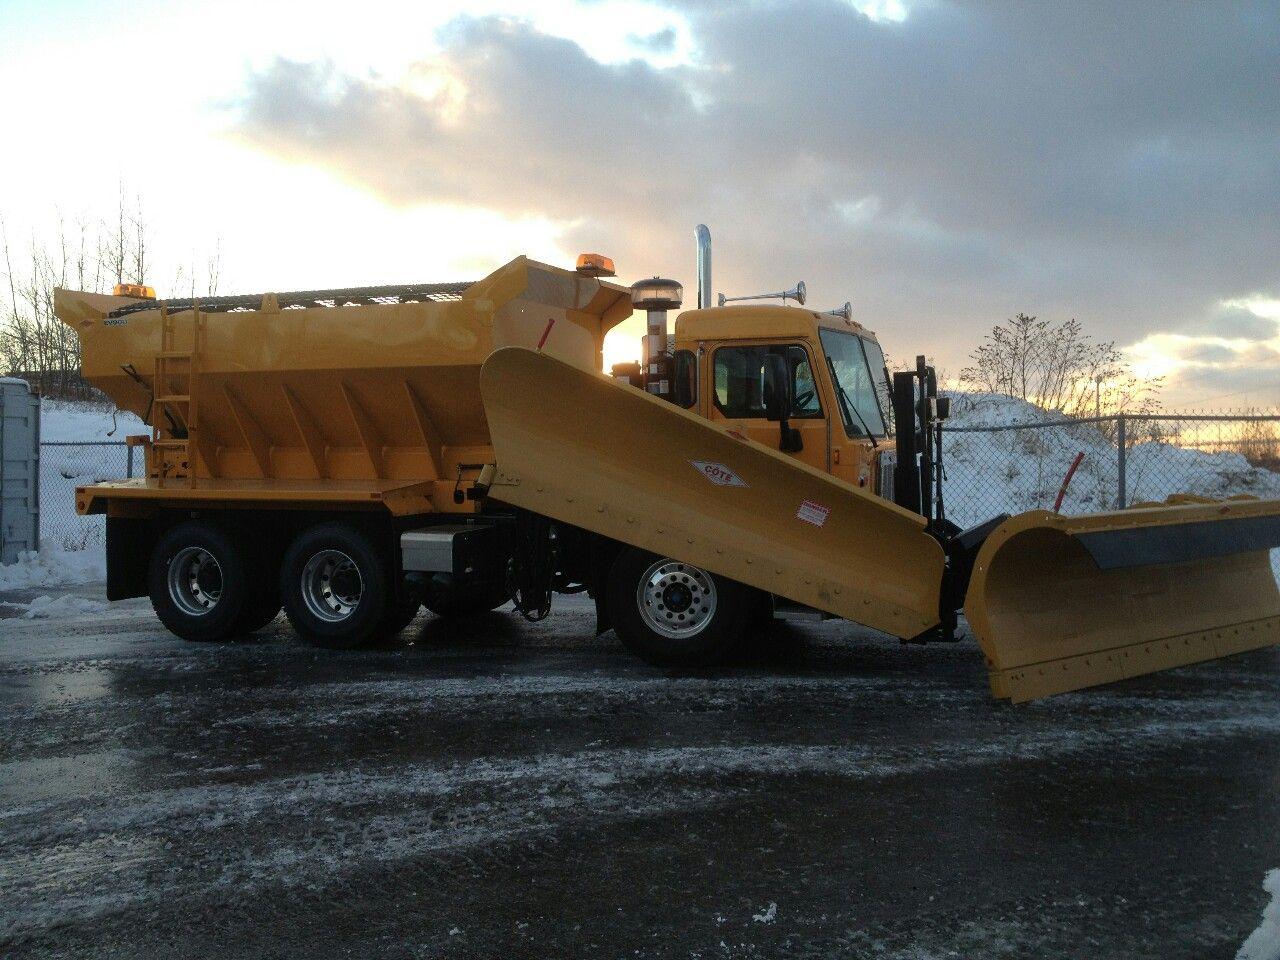 Coe Peterbilt 320 Plow Truck With Images Plow Truck Trucks